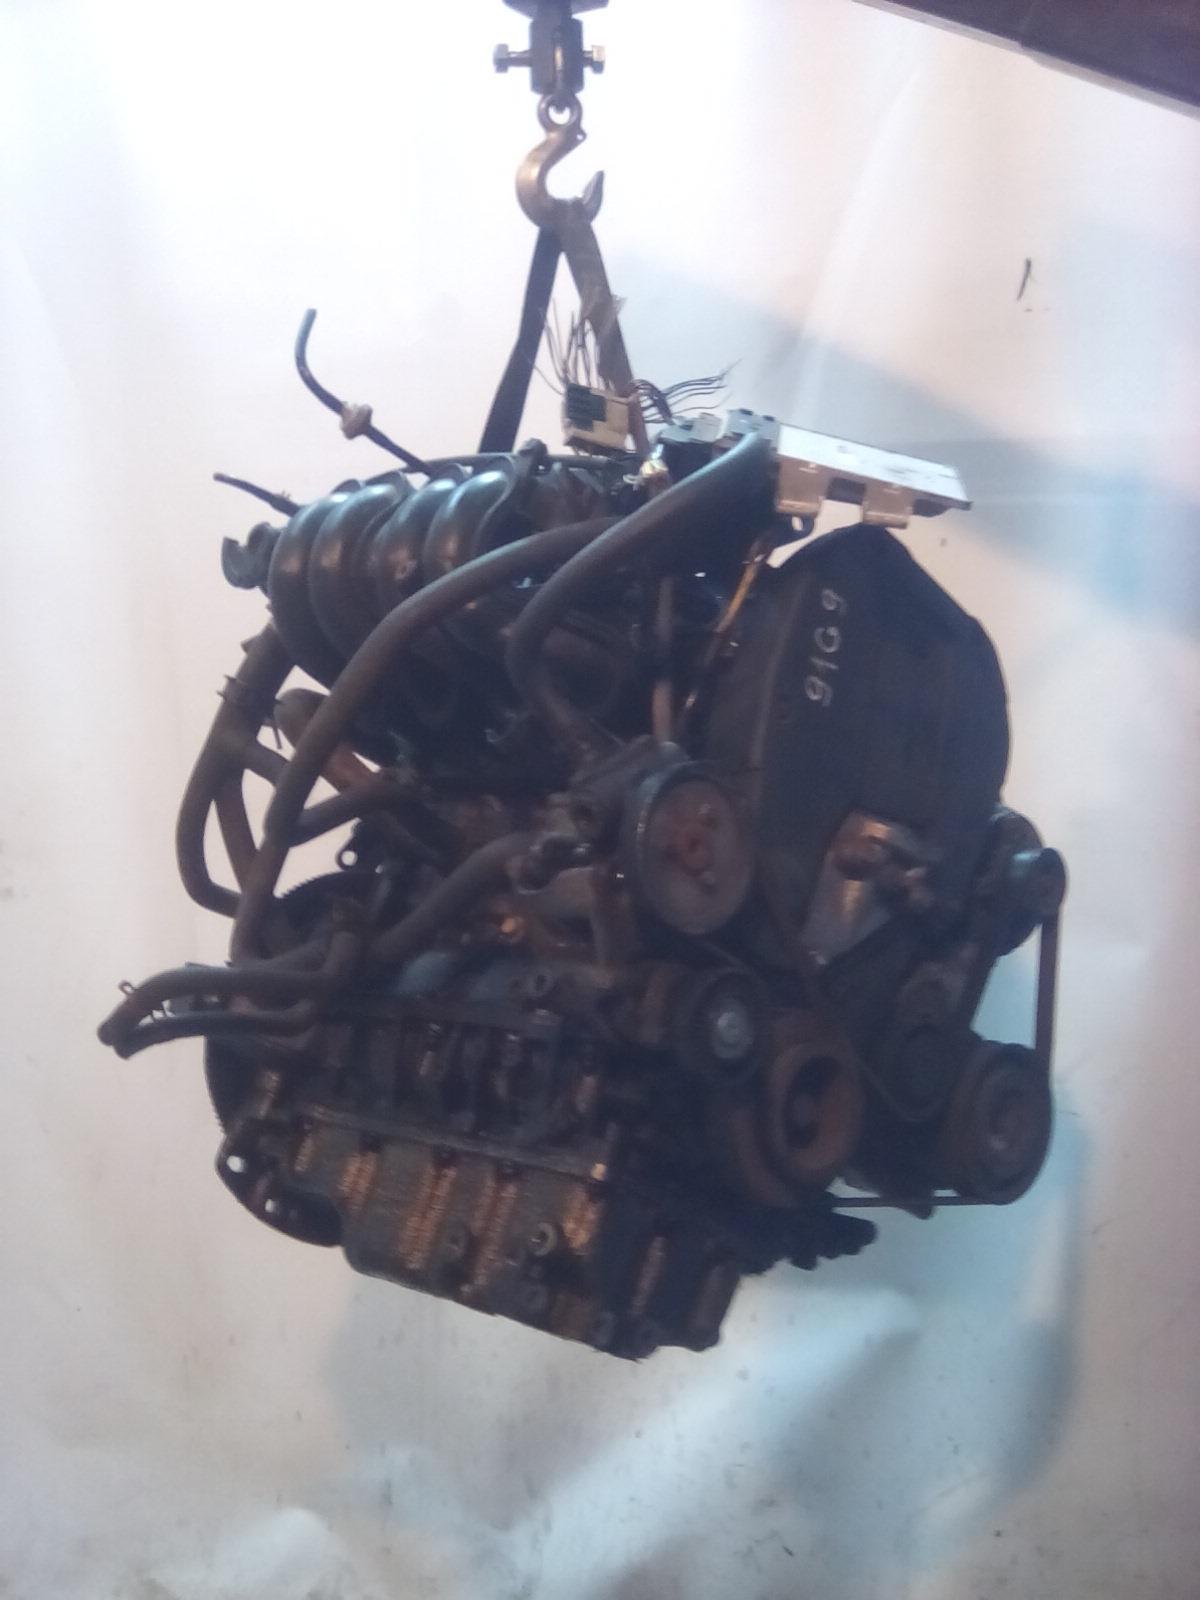 Двигатель бензиновый, LAND ROVER, FREELANDER 1, 2001